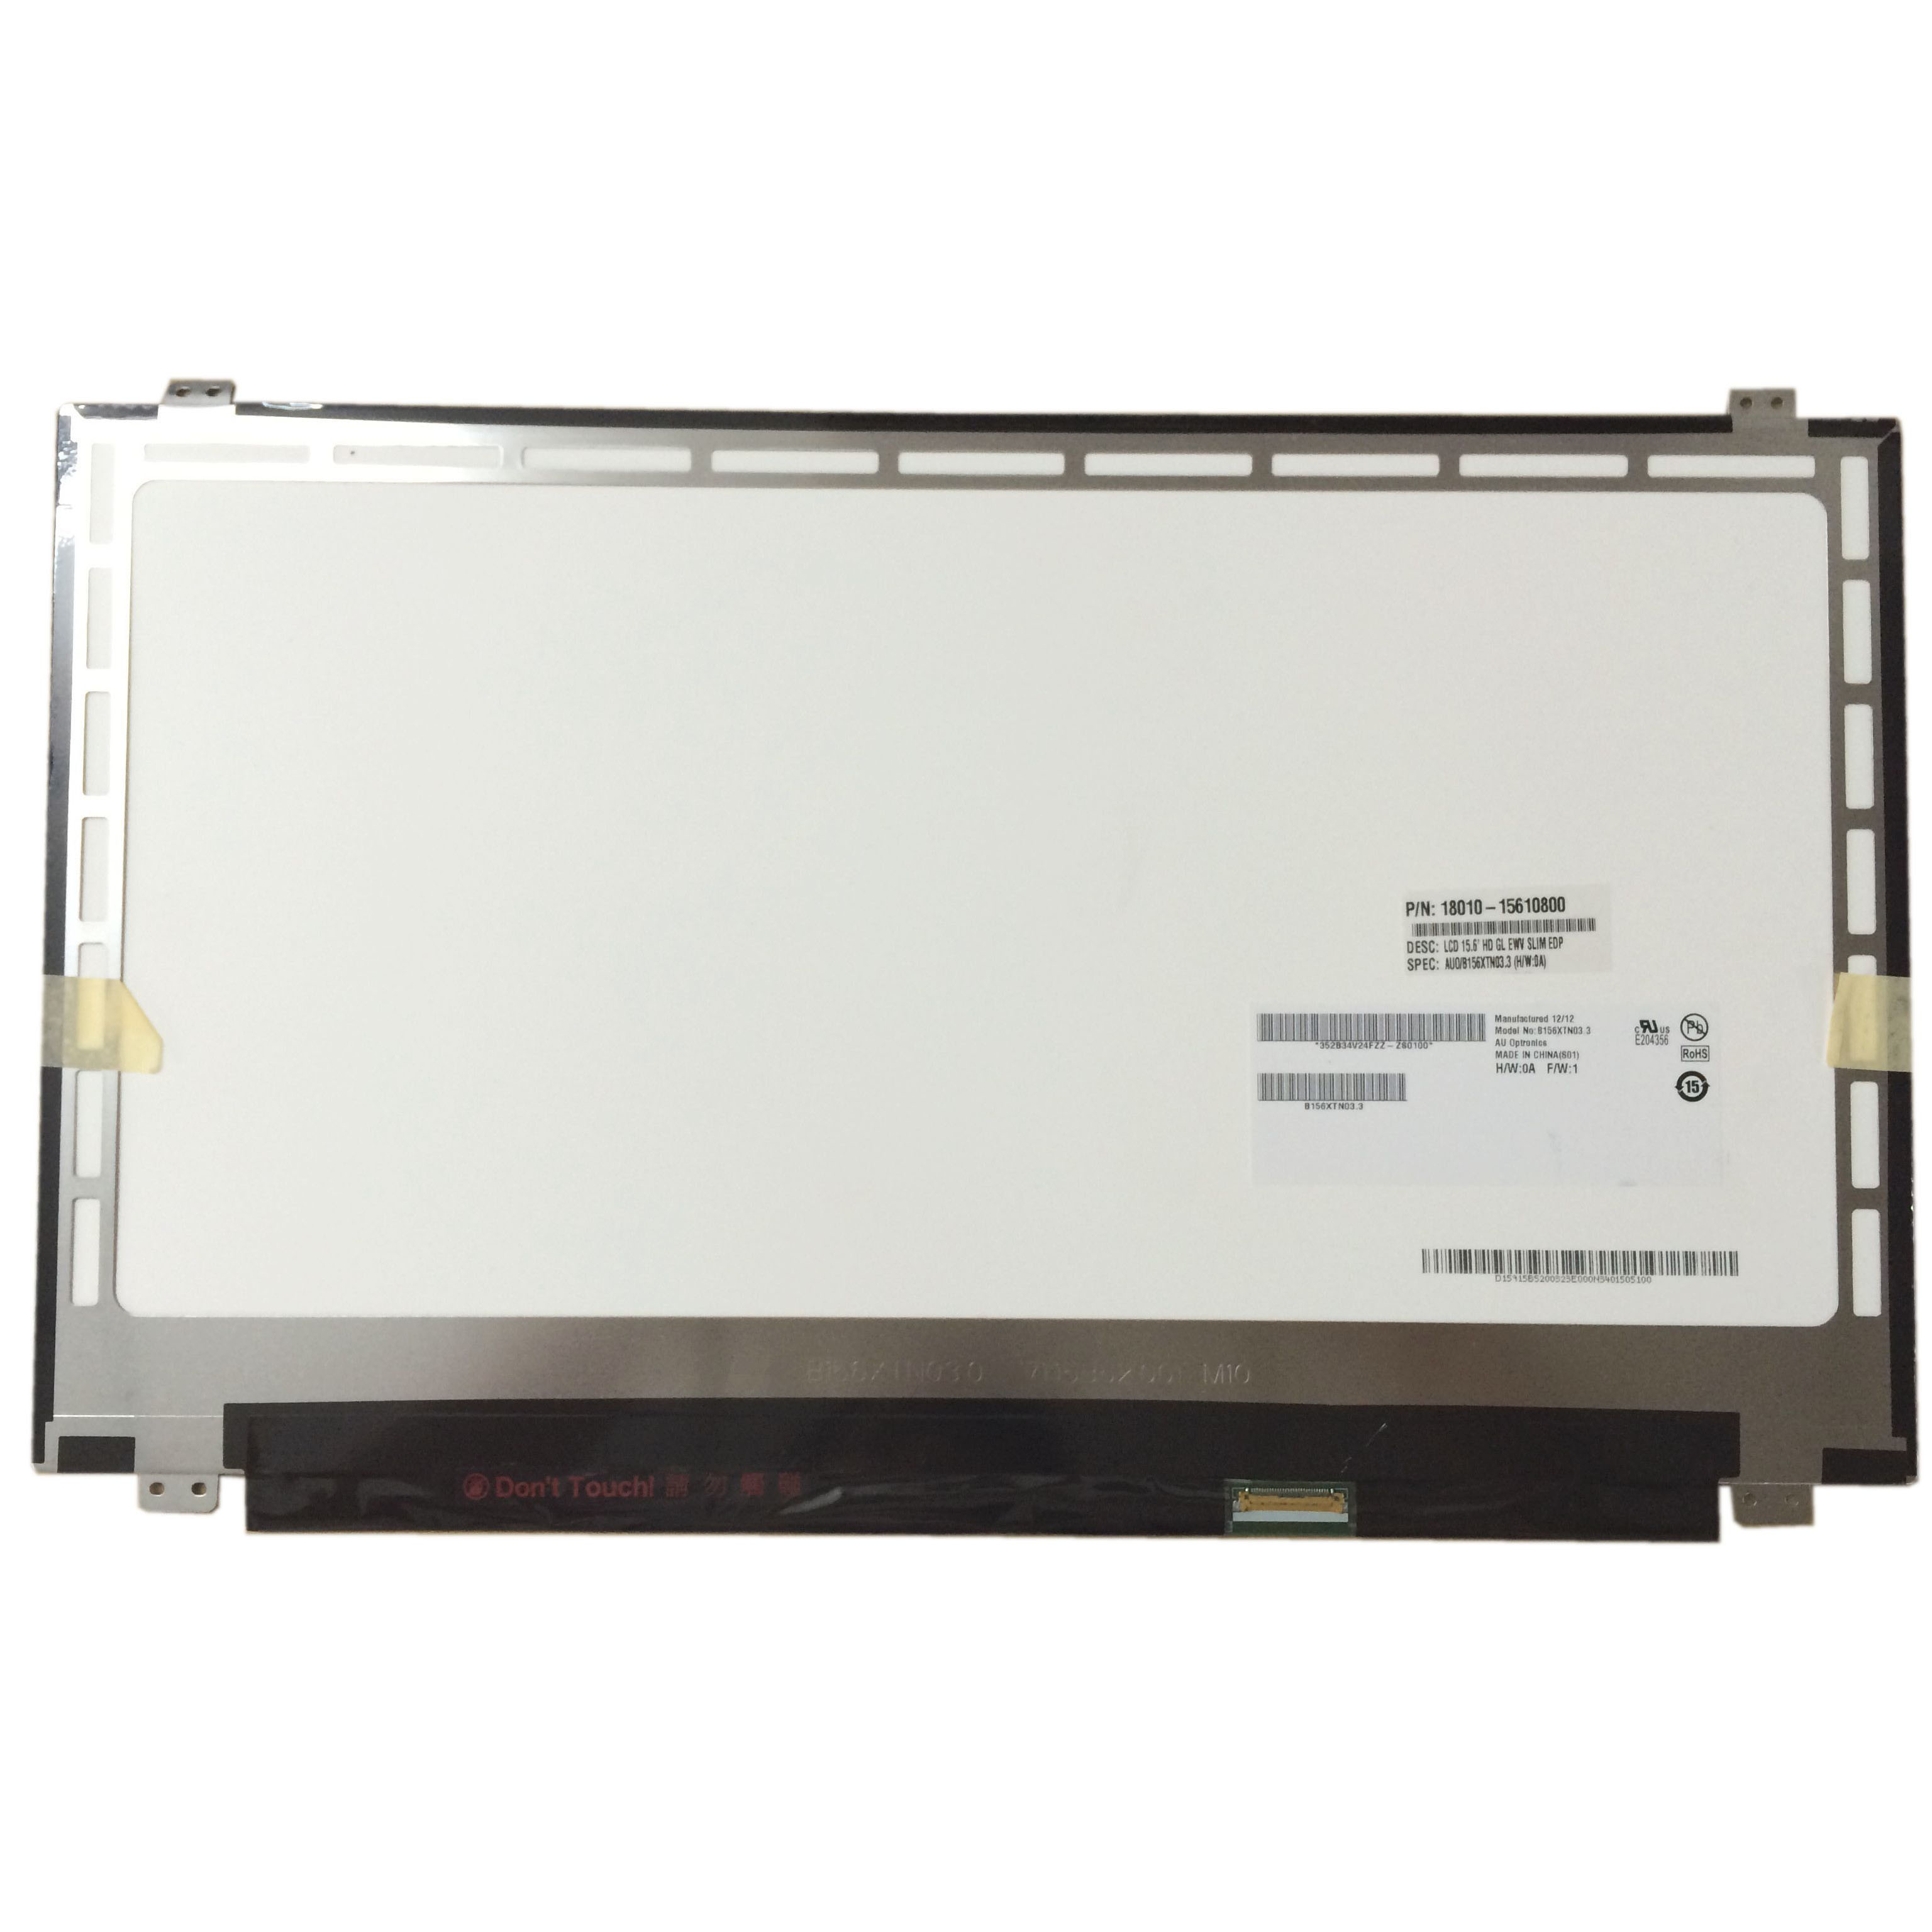 Livraison Gratuite! B156XTN03.3 NT156WHM-N12 LP156WHU TPA1 B156XW04 V.8 LP156WHB TPD1 LTN156AT31 écran lcd d'ordinateur portable panneau 30pin